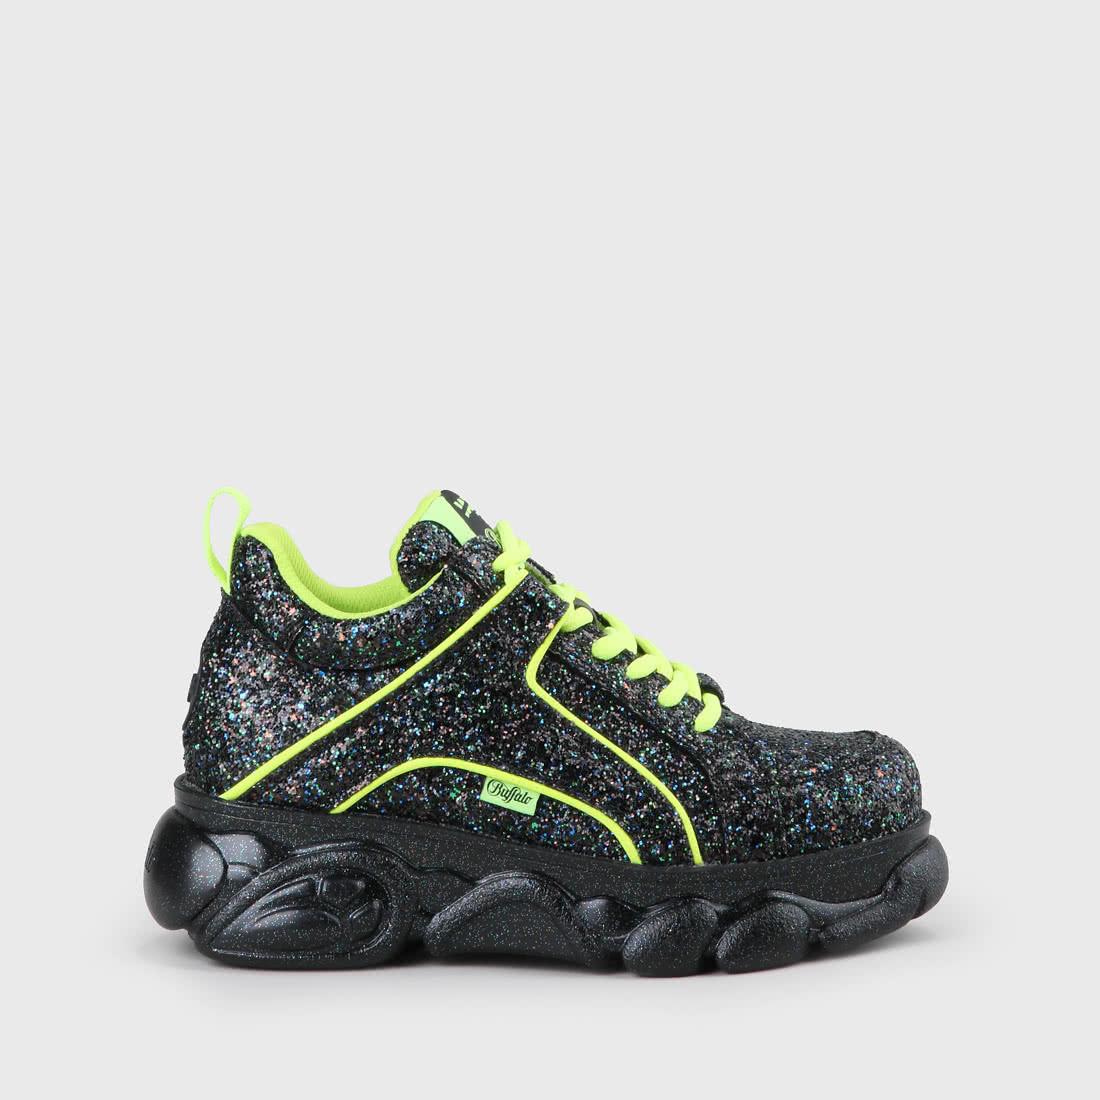 reputable site 8d3b0 28cd7 Jaded x CLD Corin Sneaker navy mit Glitzer